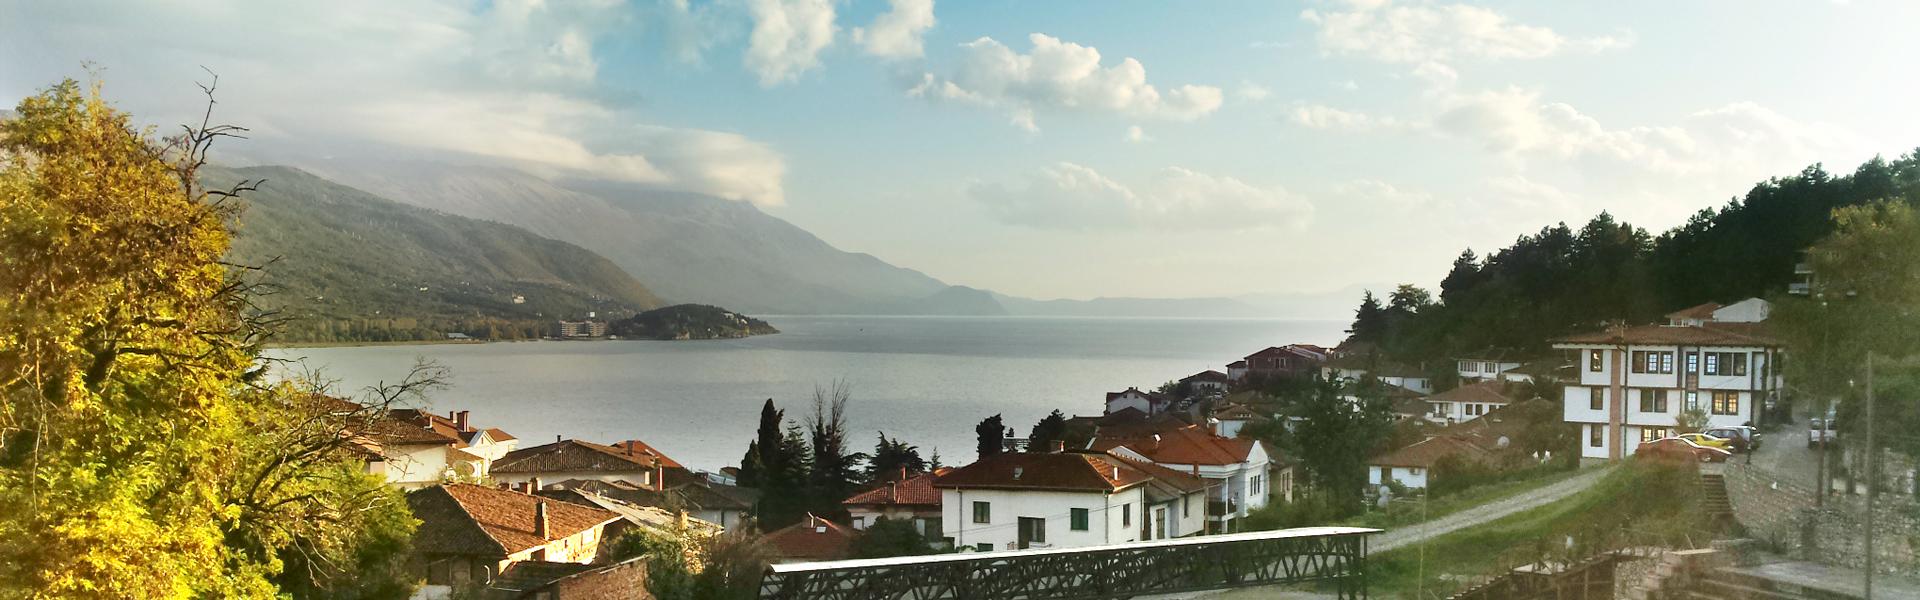 macedonia-ohrid